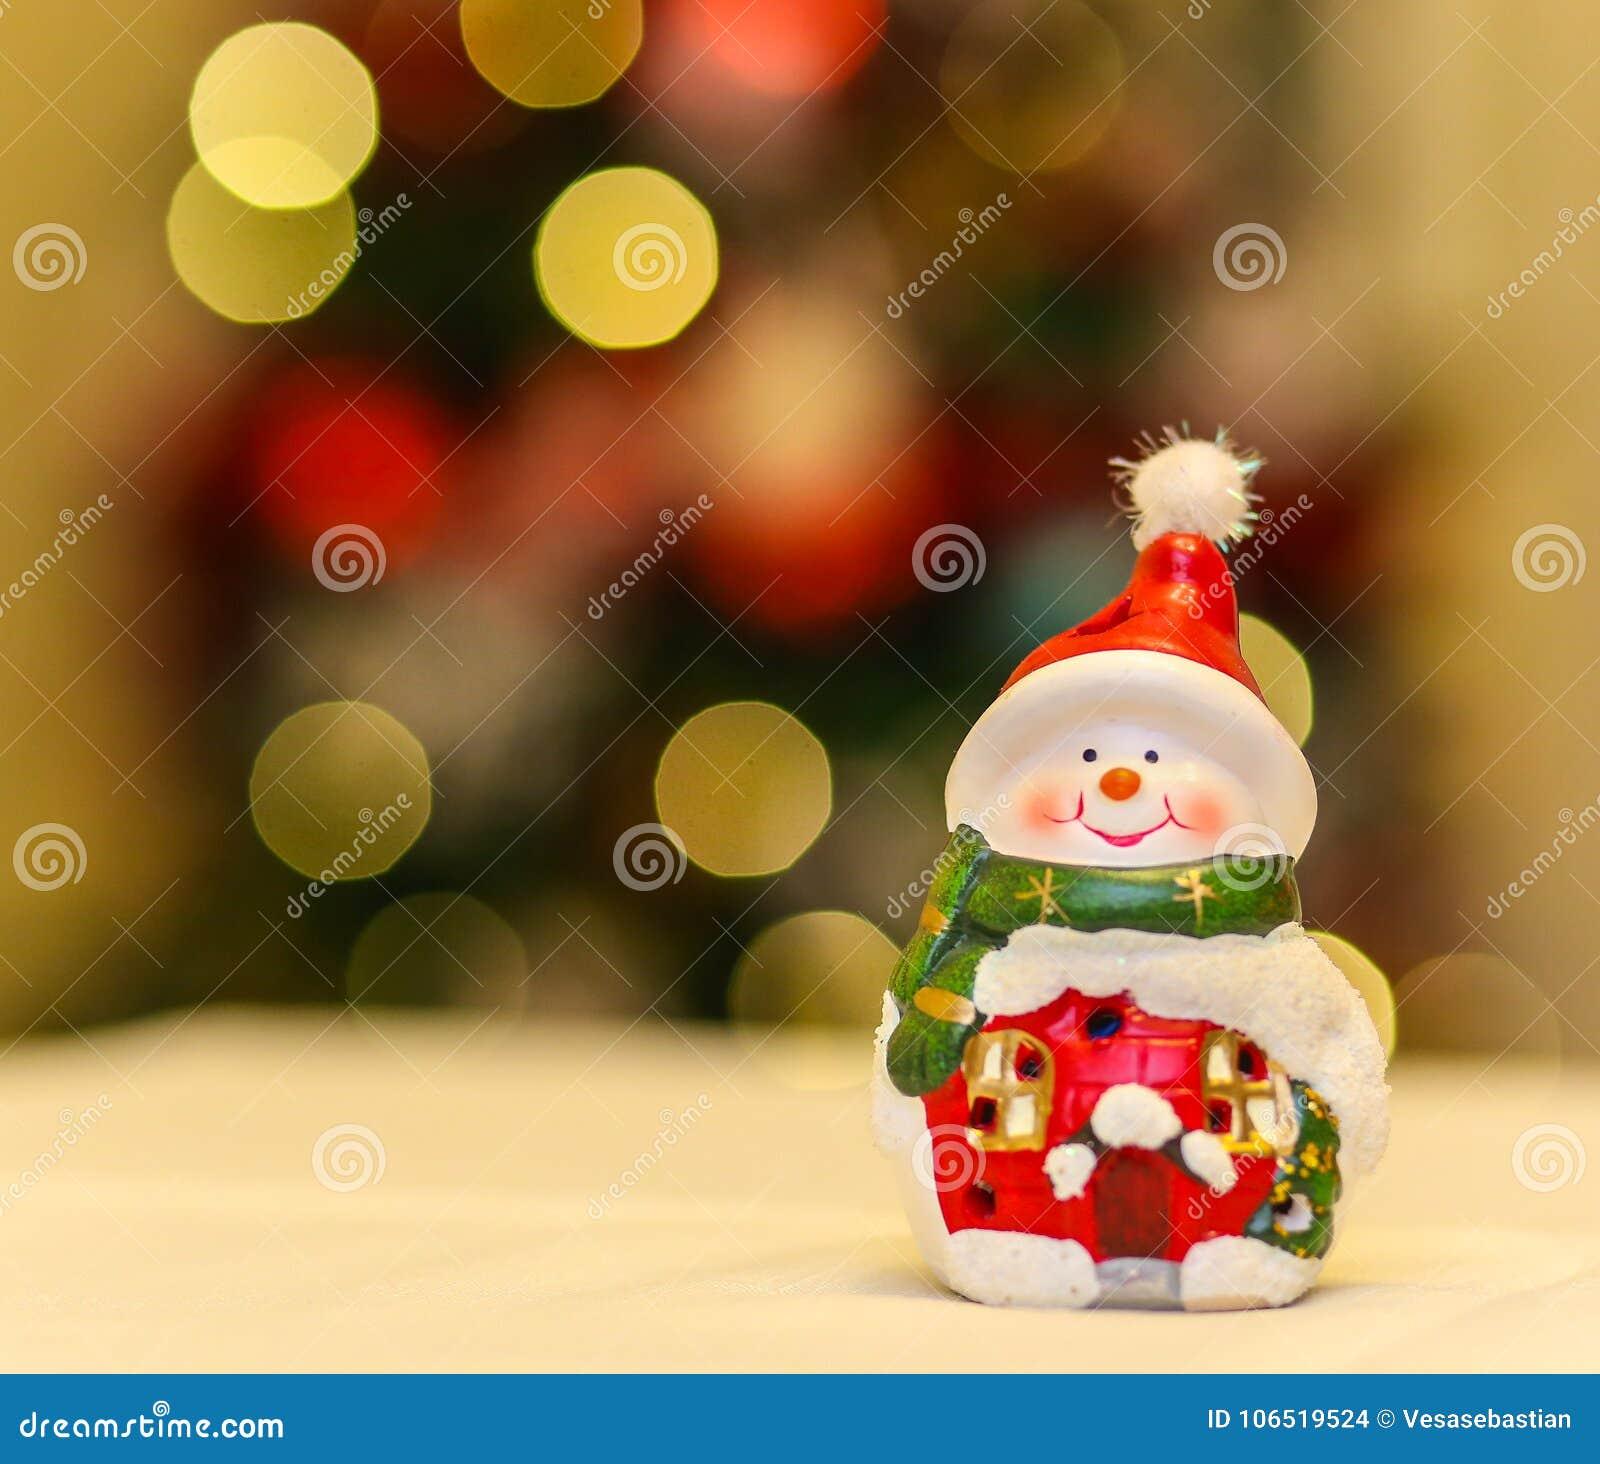 Ceramic Snowman Decoration With Christmas Tree Lights Stock Photo